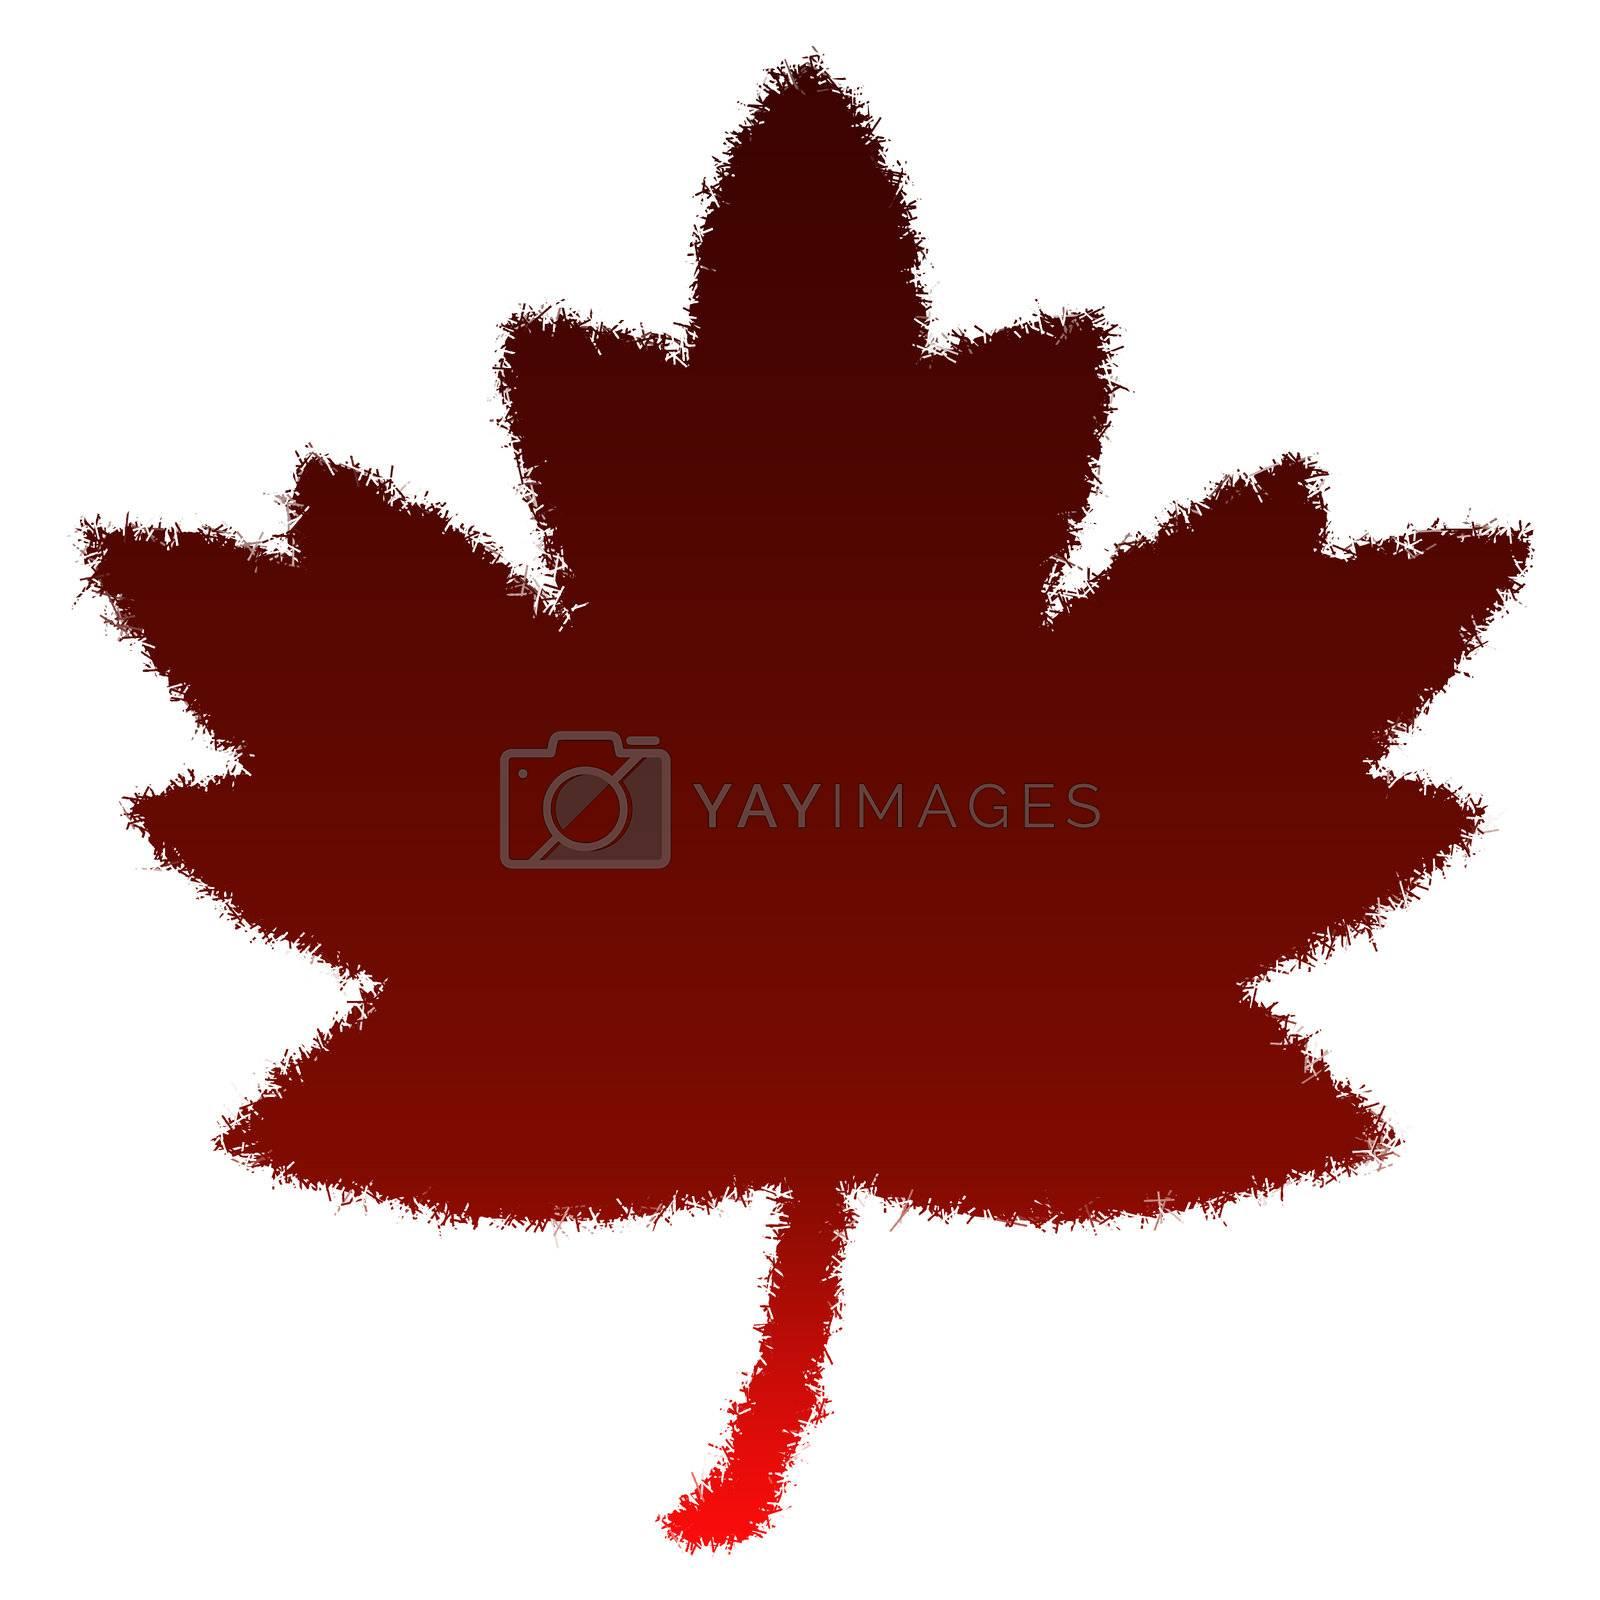 Autumn leaf on a white background. A red autumn leaf